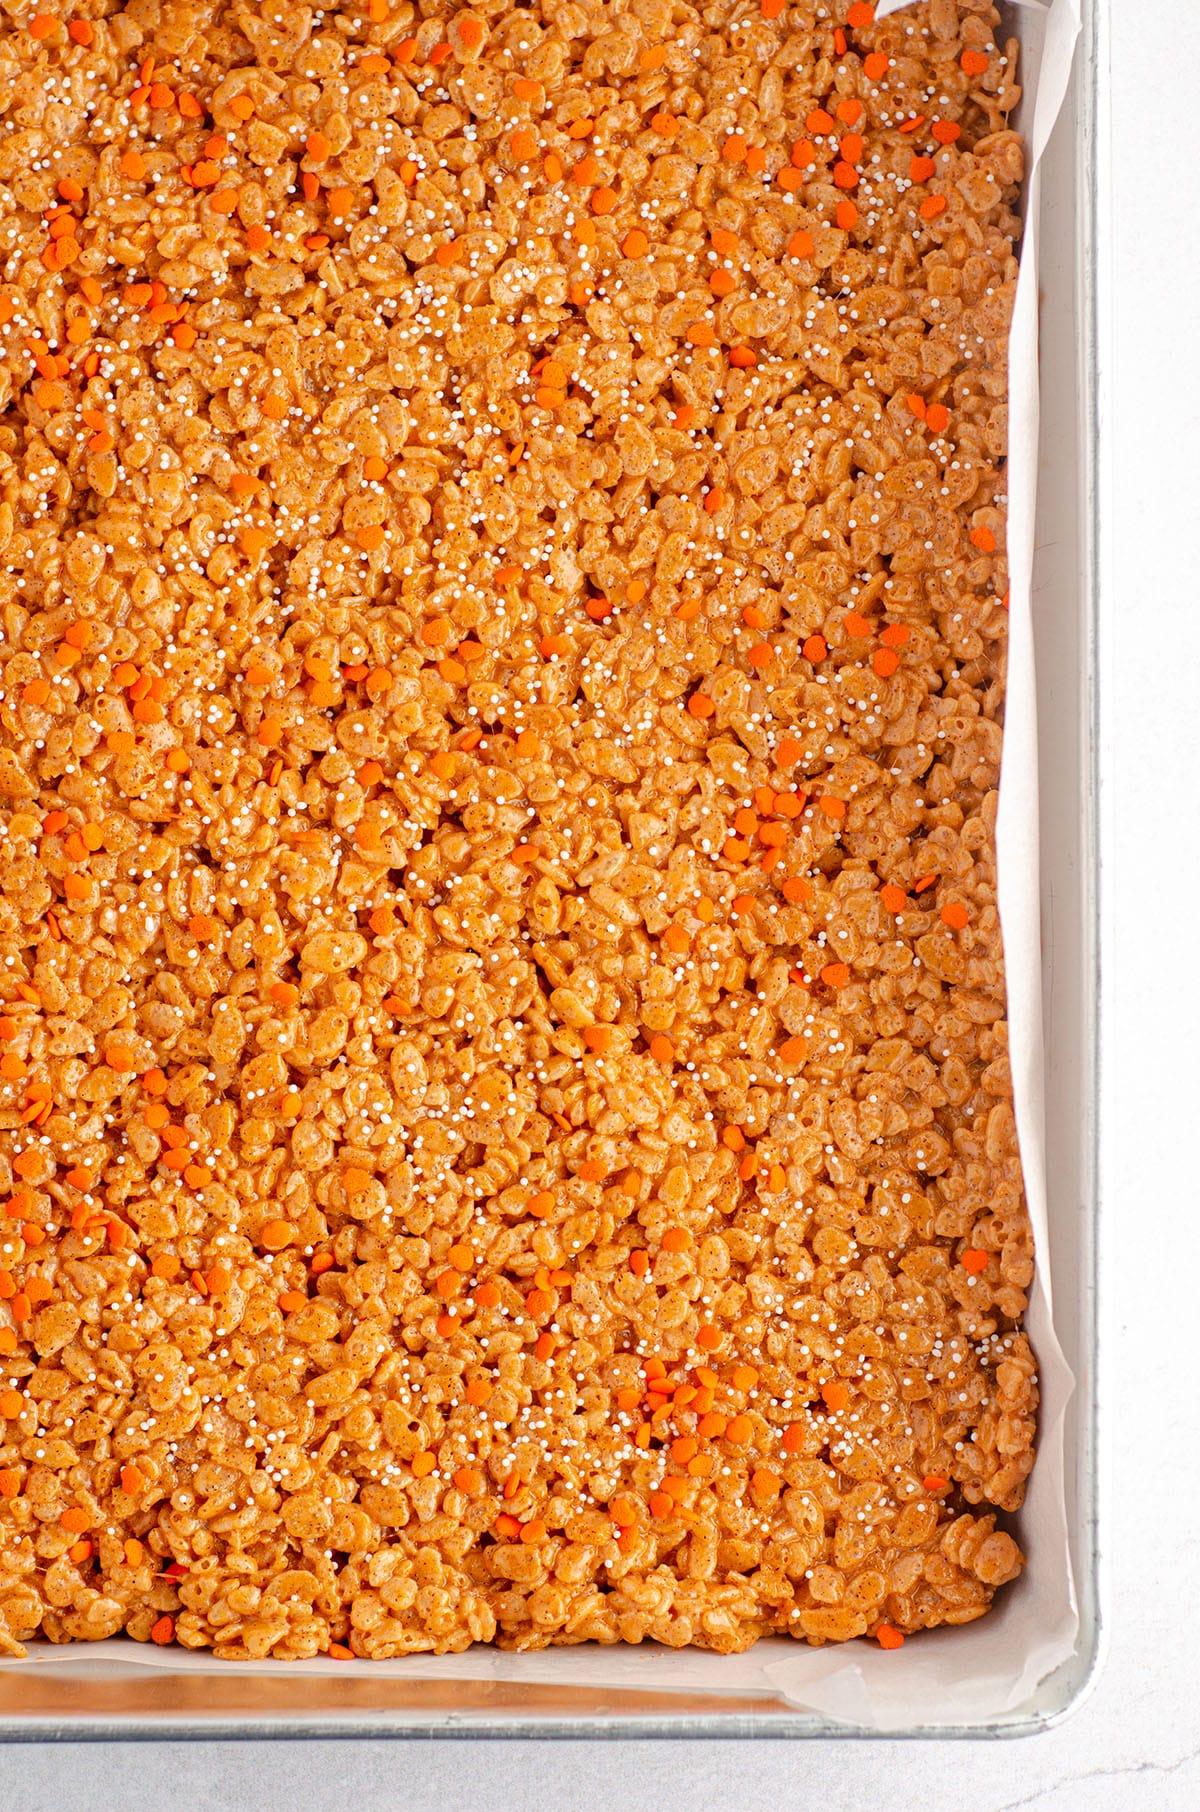 pumpkin rice krispies treats in a pan